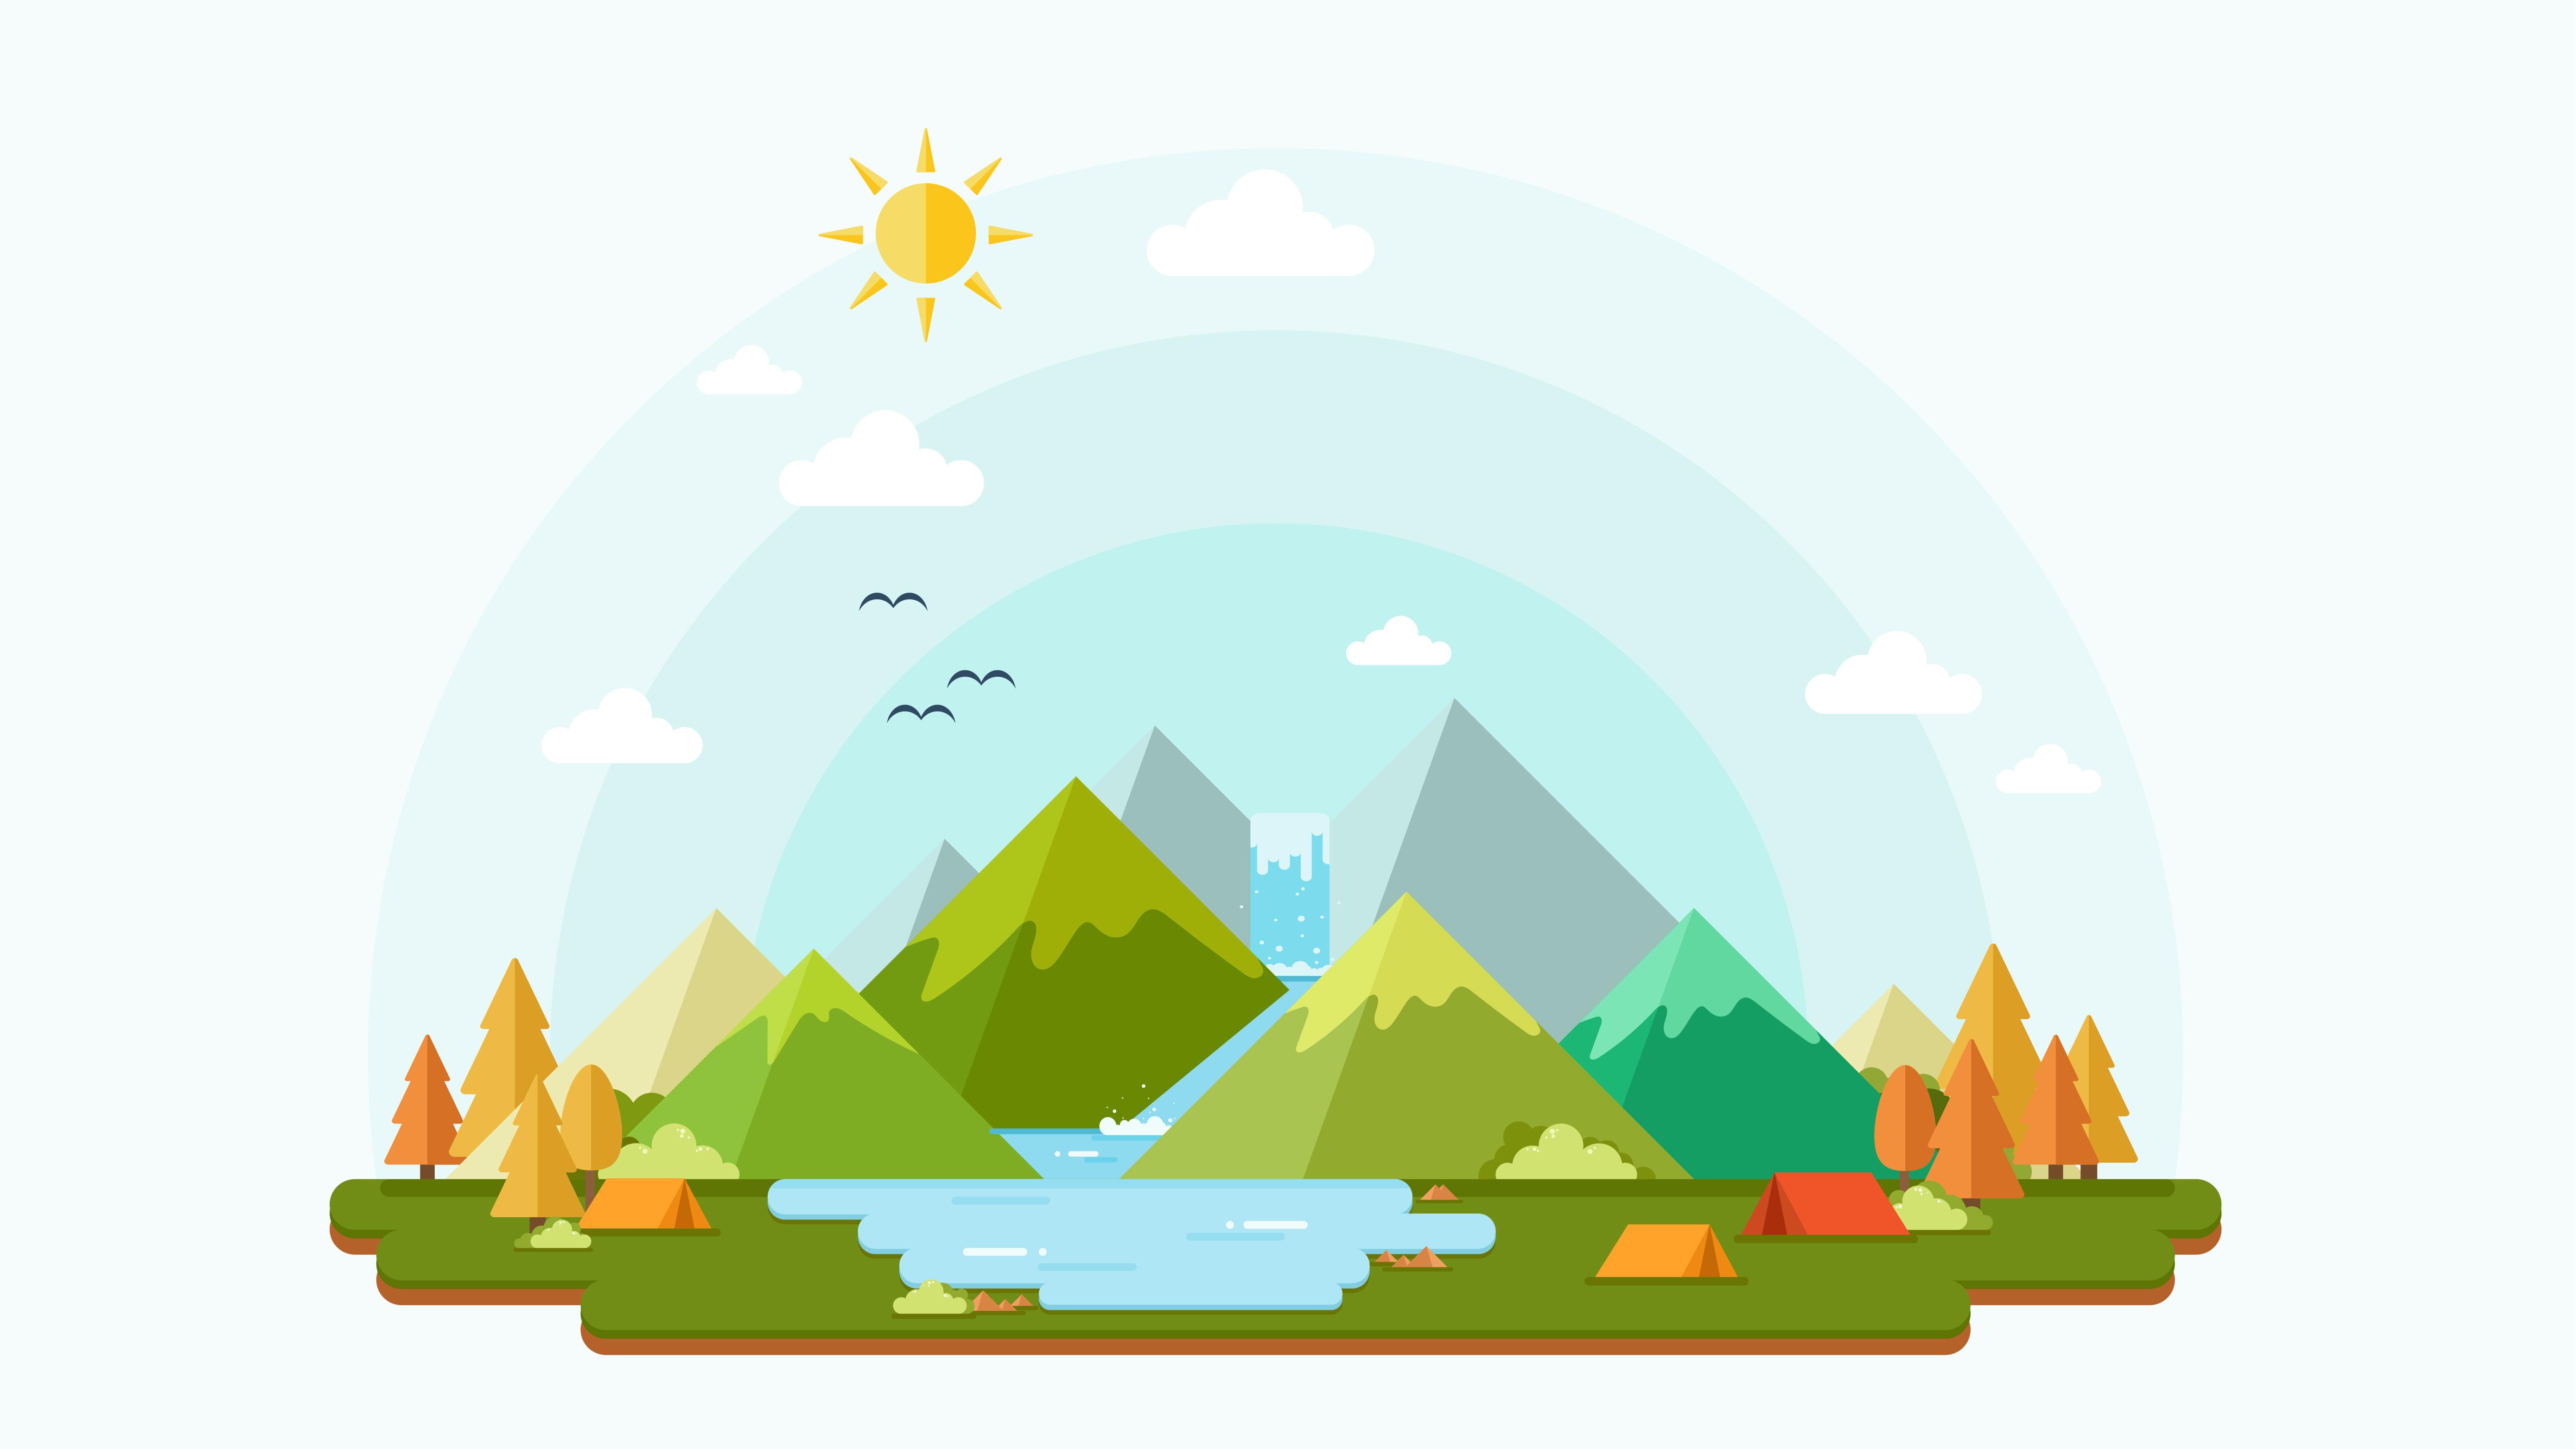 Flat Design Of Nature Landscape Background Download Free Vectors Clipart Graphics Vector Art